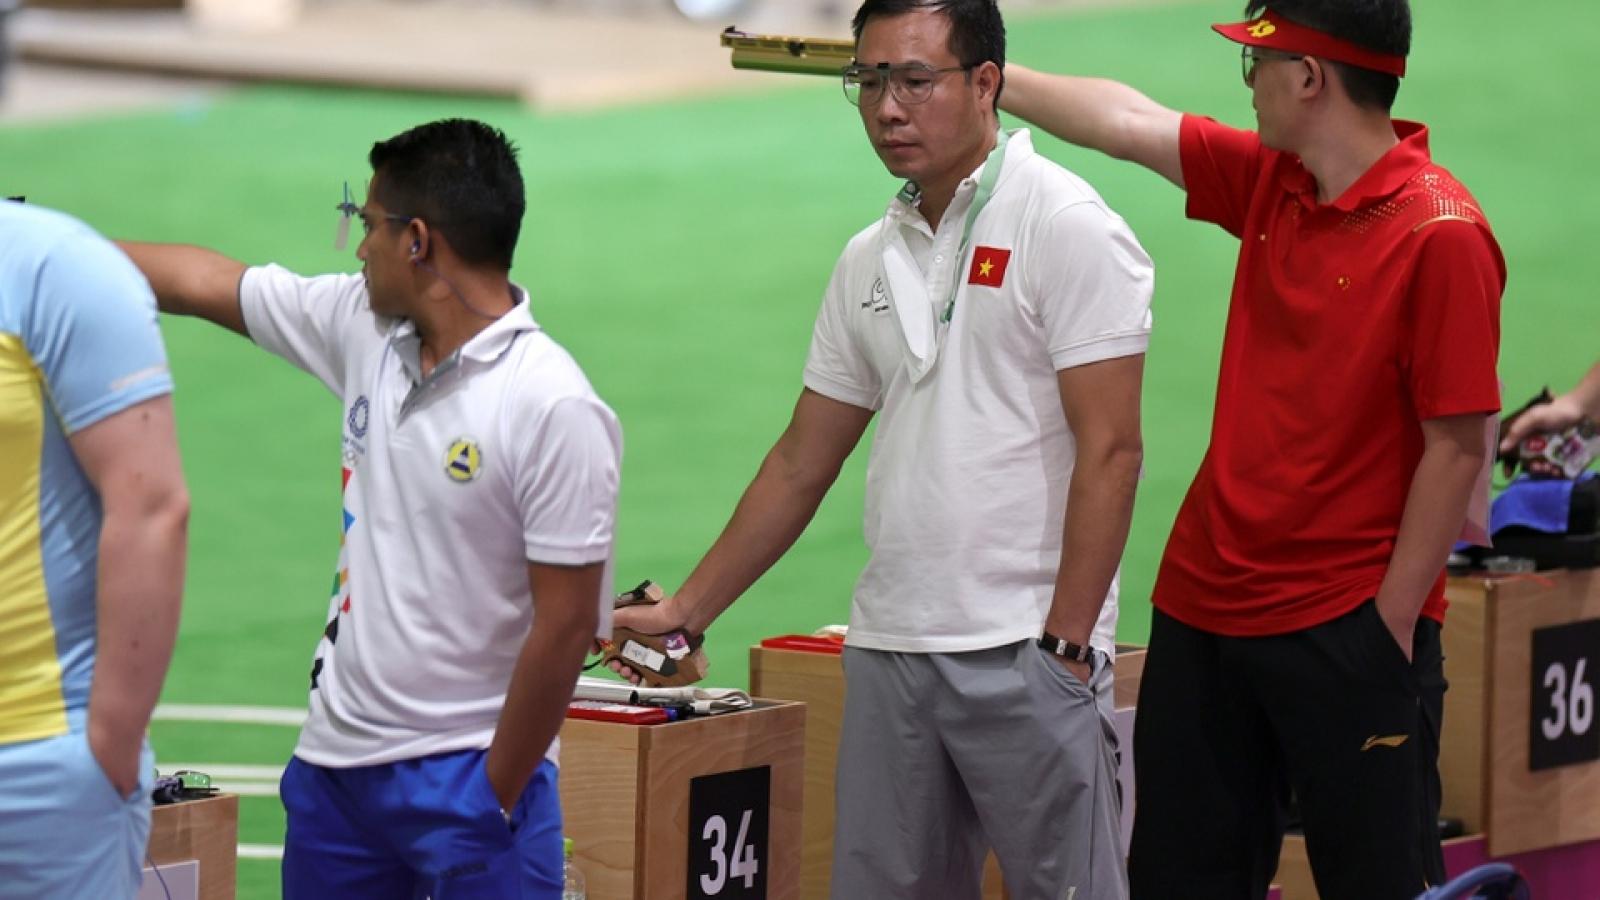 Tokyo 2020 Olympics update: Veteran marksman Xuan Vinh ousted